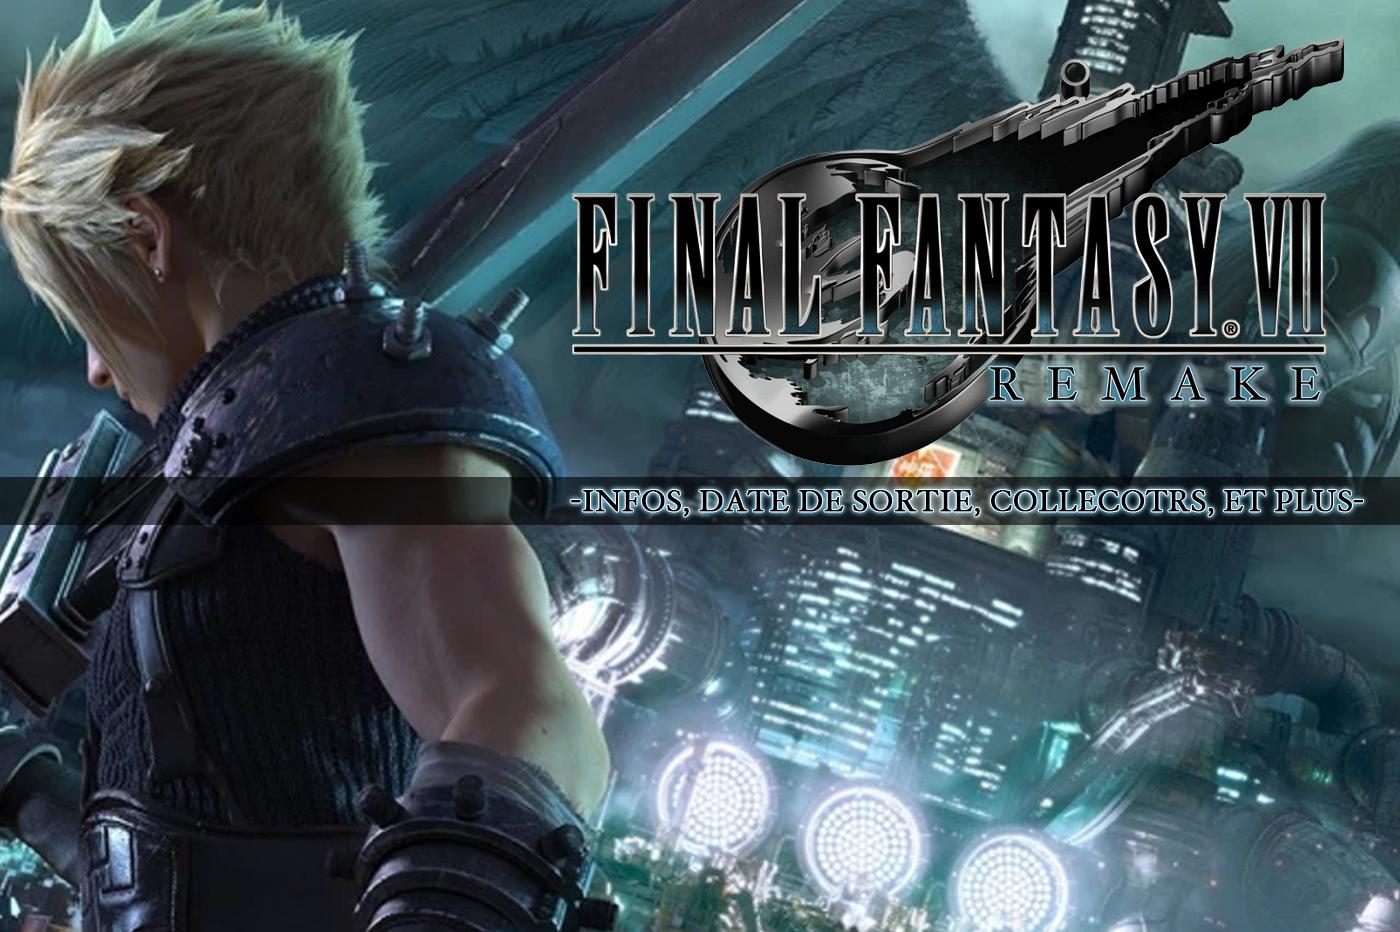 Final Fantasy VII Remake Infos, Dates, Collectors